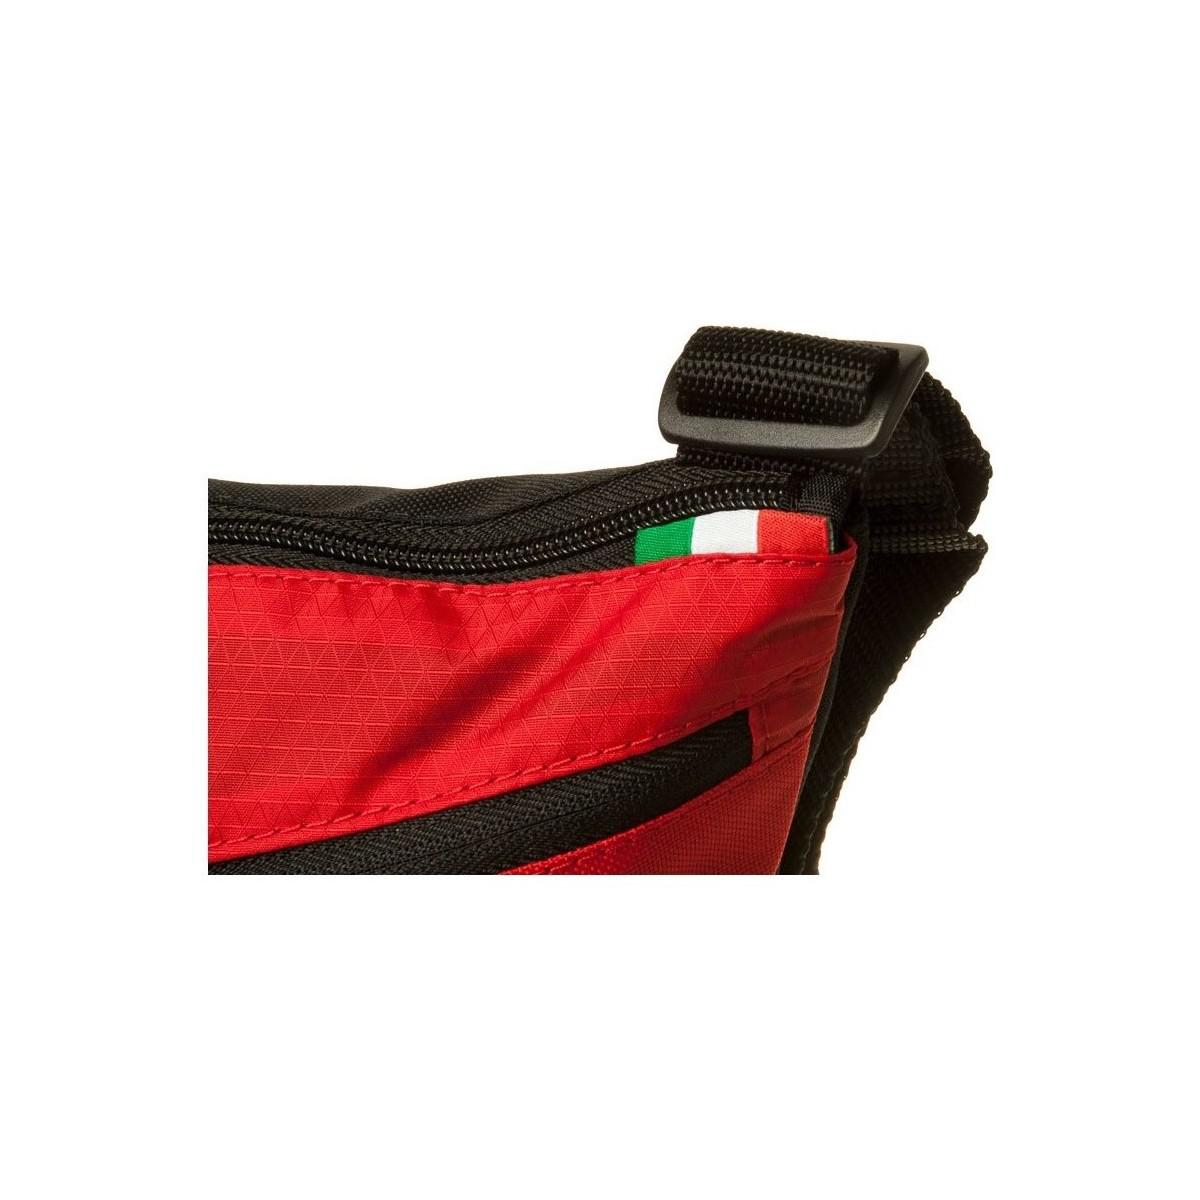 b0d74eca4ae8 ... PUMA Ferrari Fanwear Portable Women s Shoulder Bag In Red in Red for